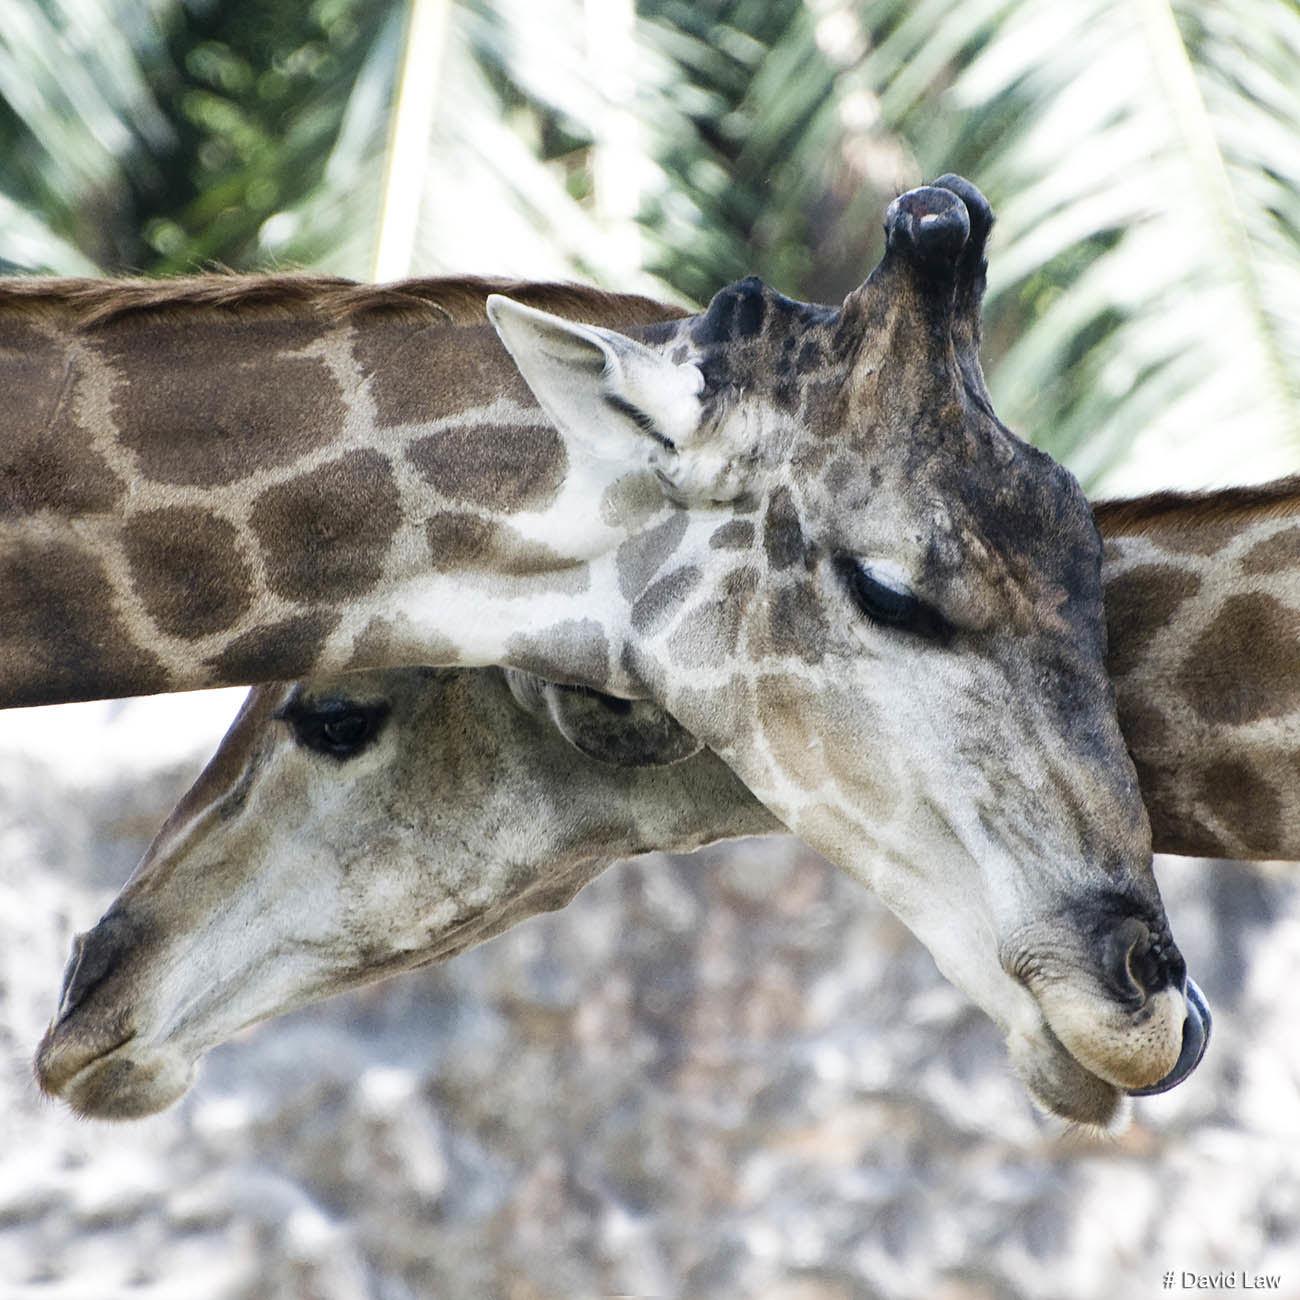 Giraffes Square wns s0220